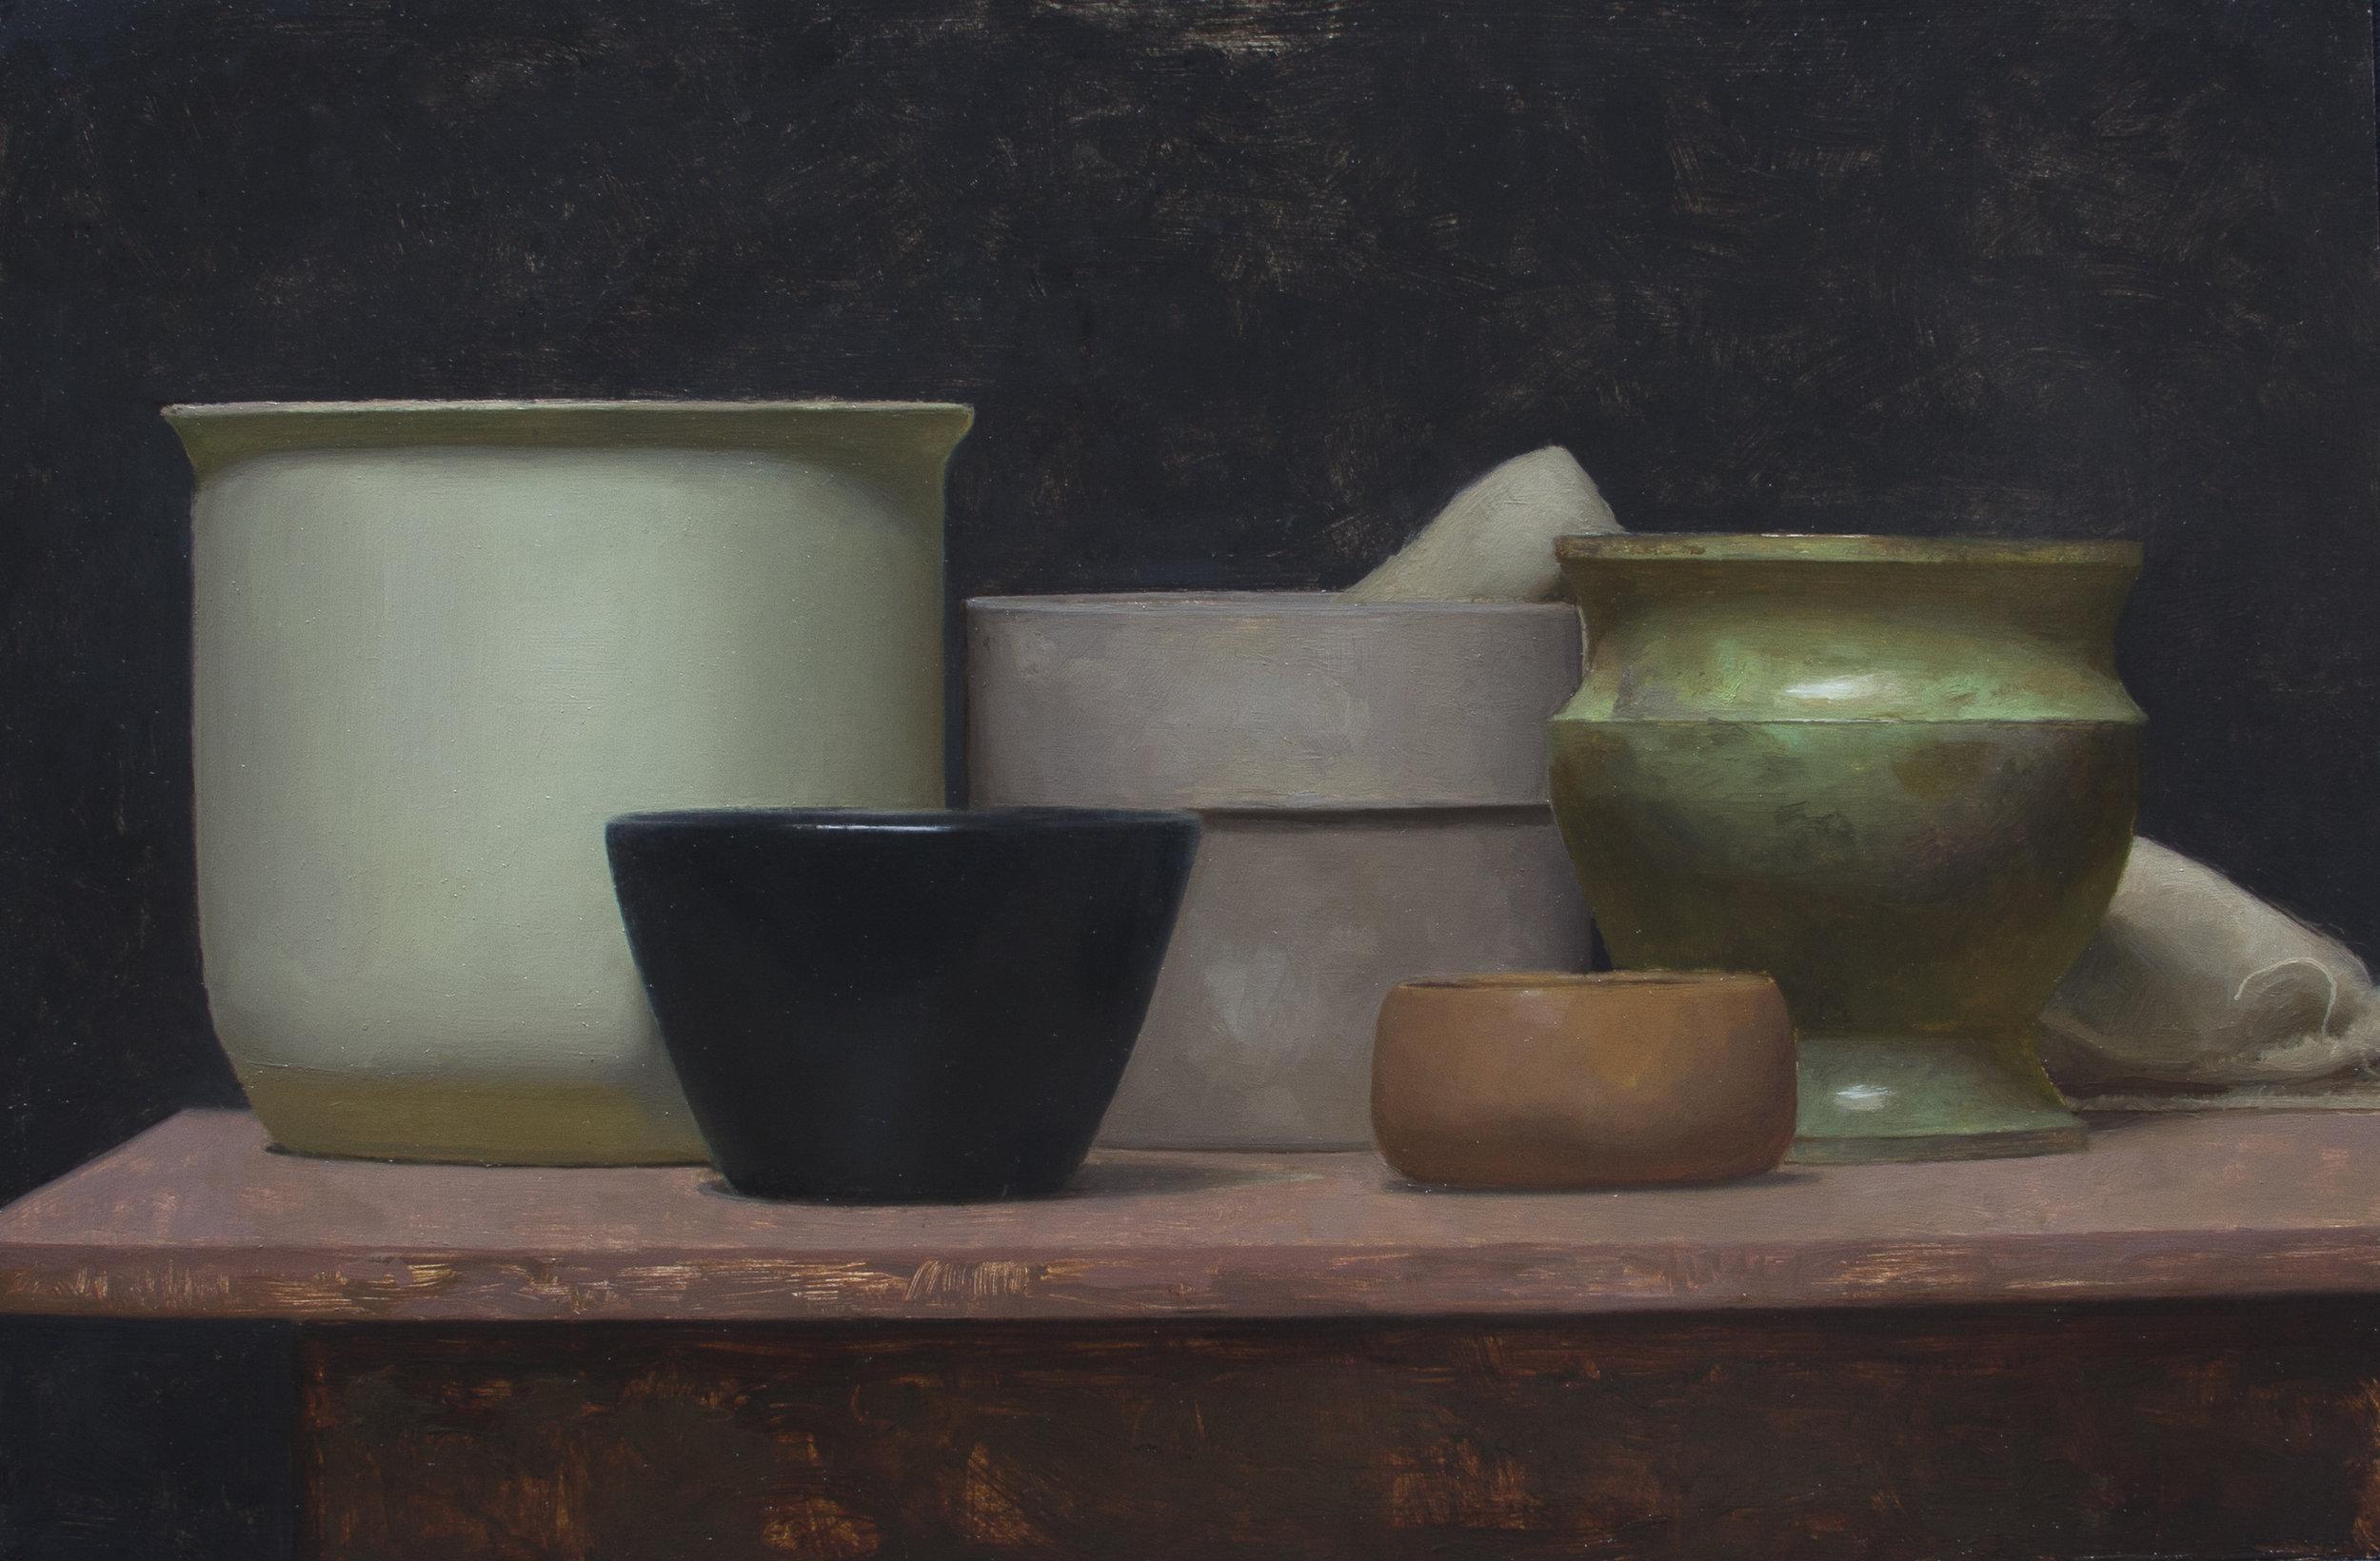 Five Vessels. 12x18. Oil on Panel